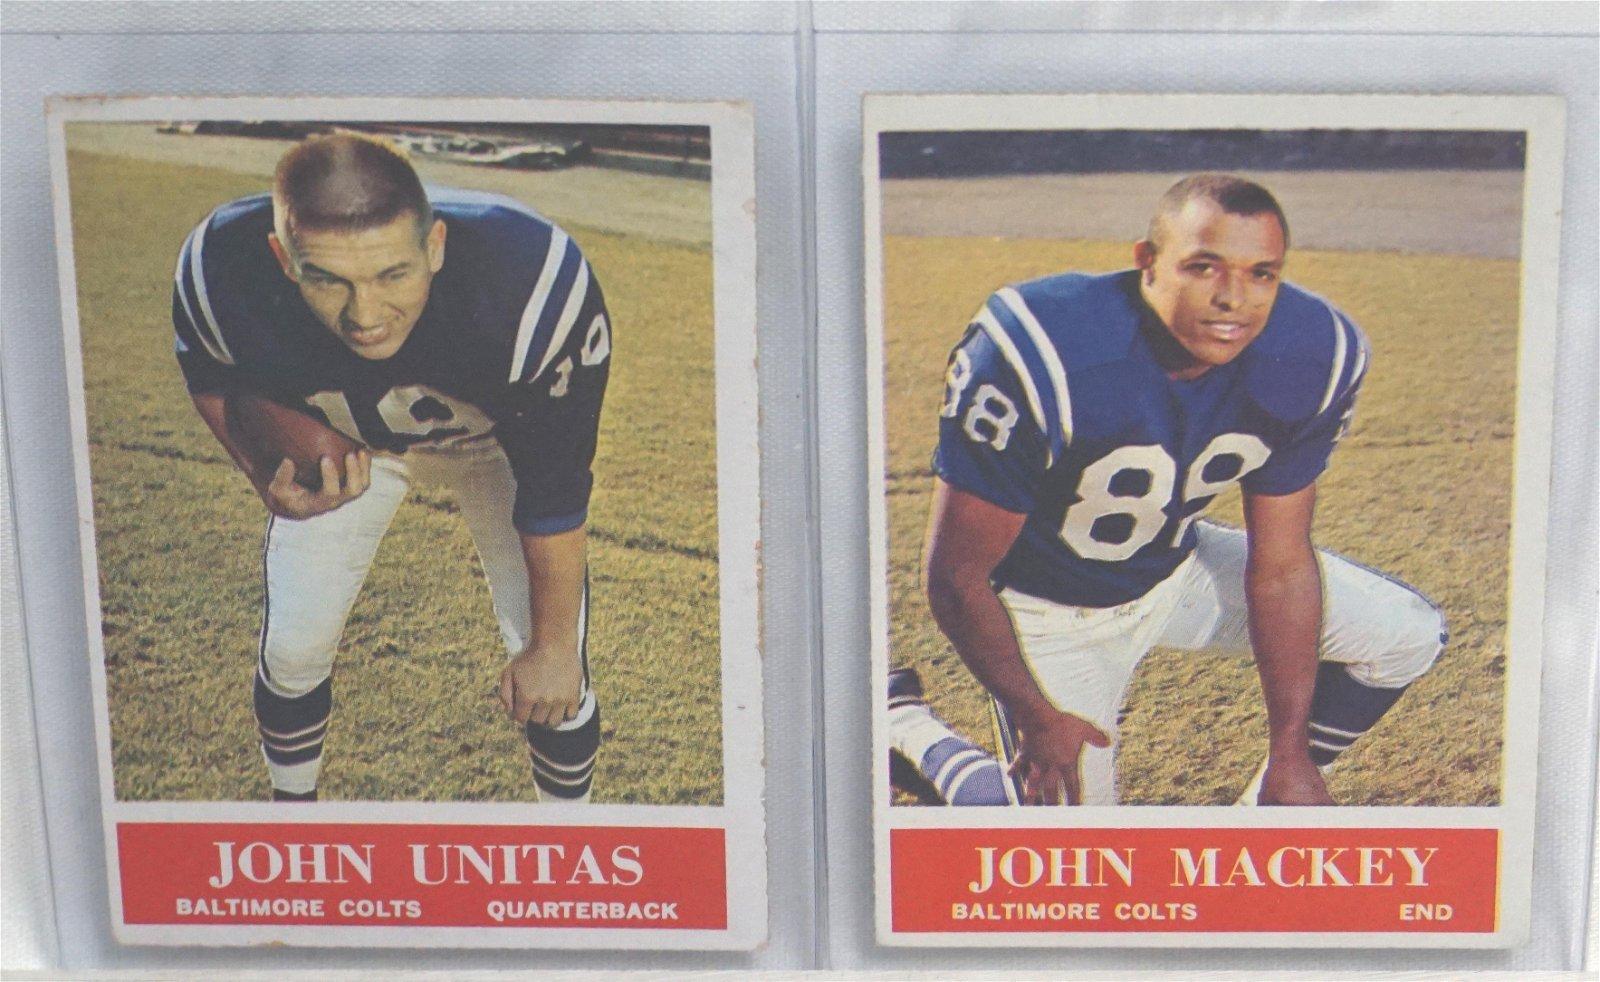 TWO 1964 #12 JOHN UNITAS #3 JOHN MACKEY